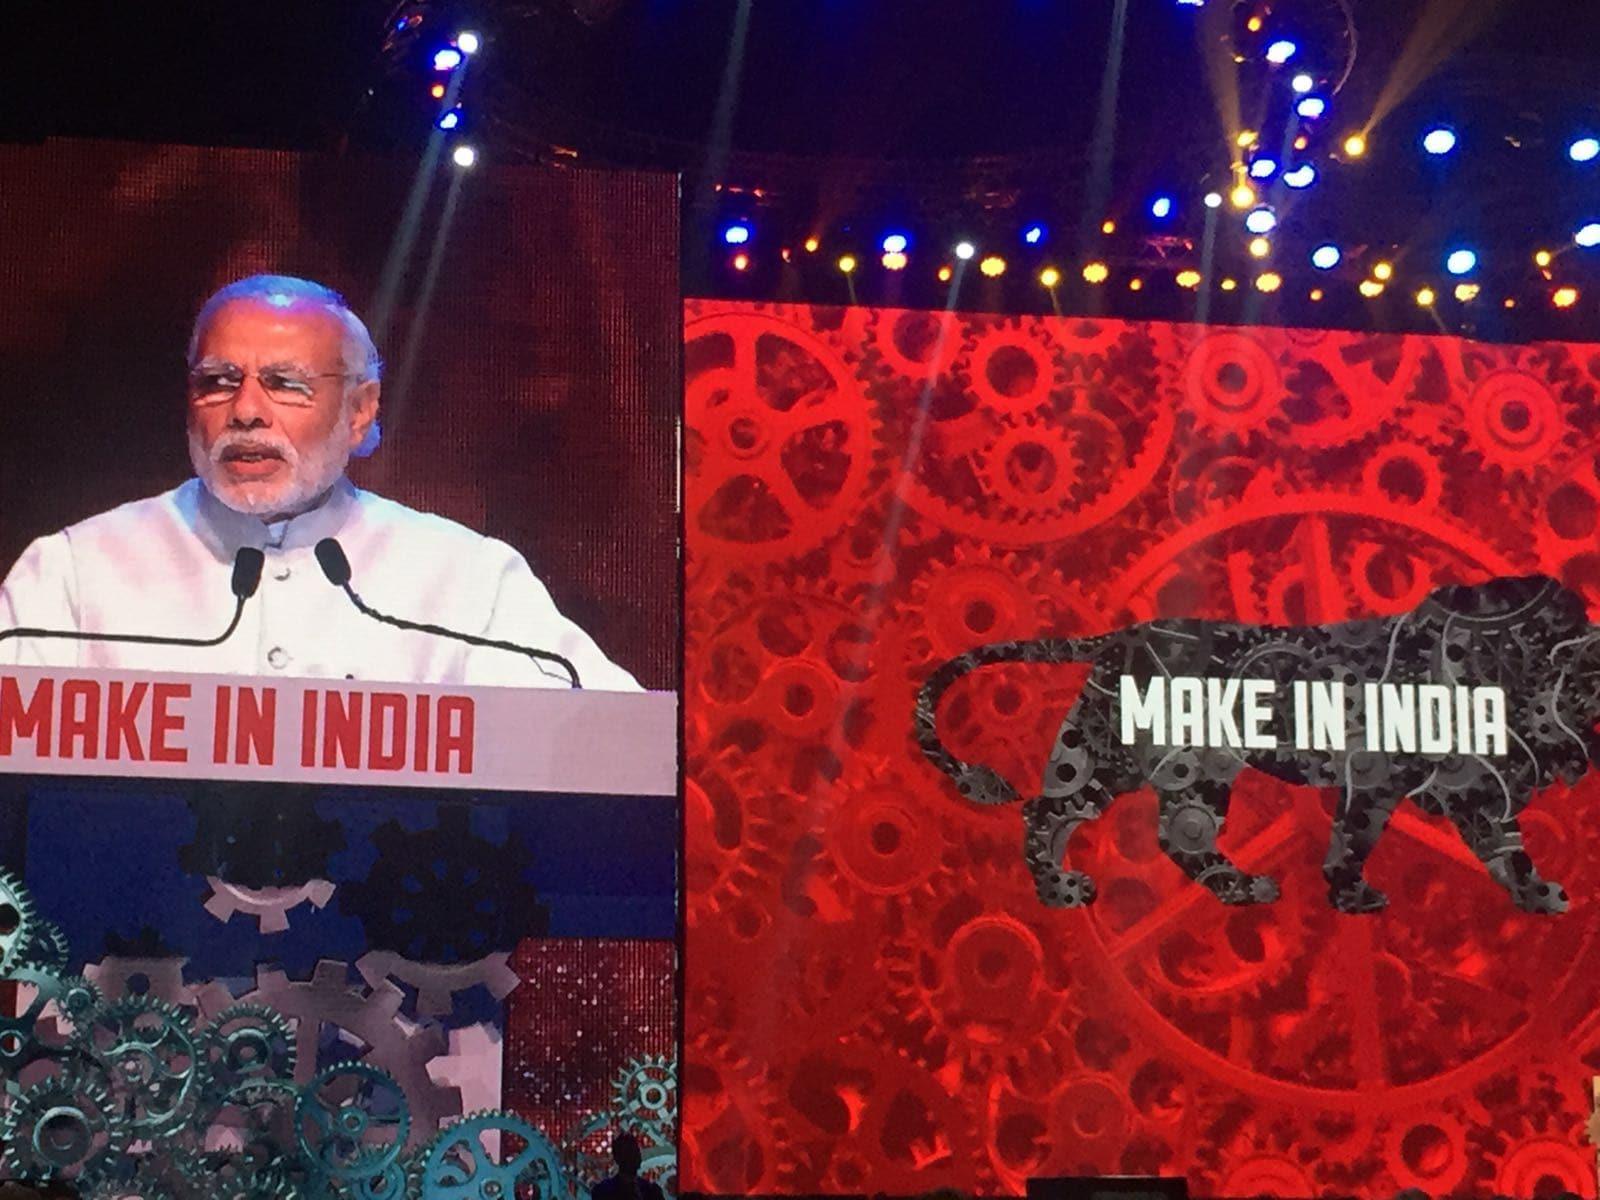 Make in India, inauguration, Mumbai, Narendra Modi, Cyrus Mistry, Stefan Lofven, Juha Sipila, Sweden, Finland, Poland, Mukesh Ambani